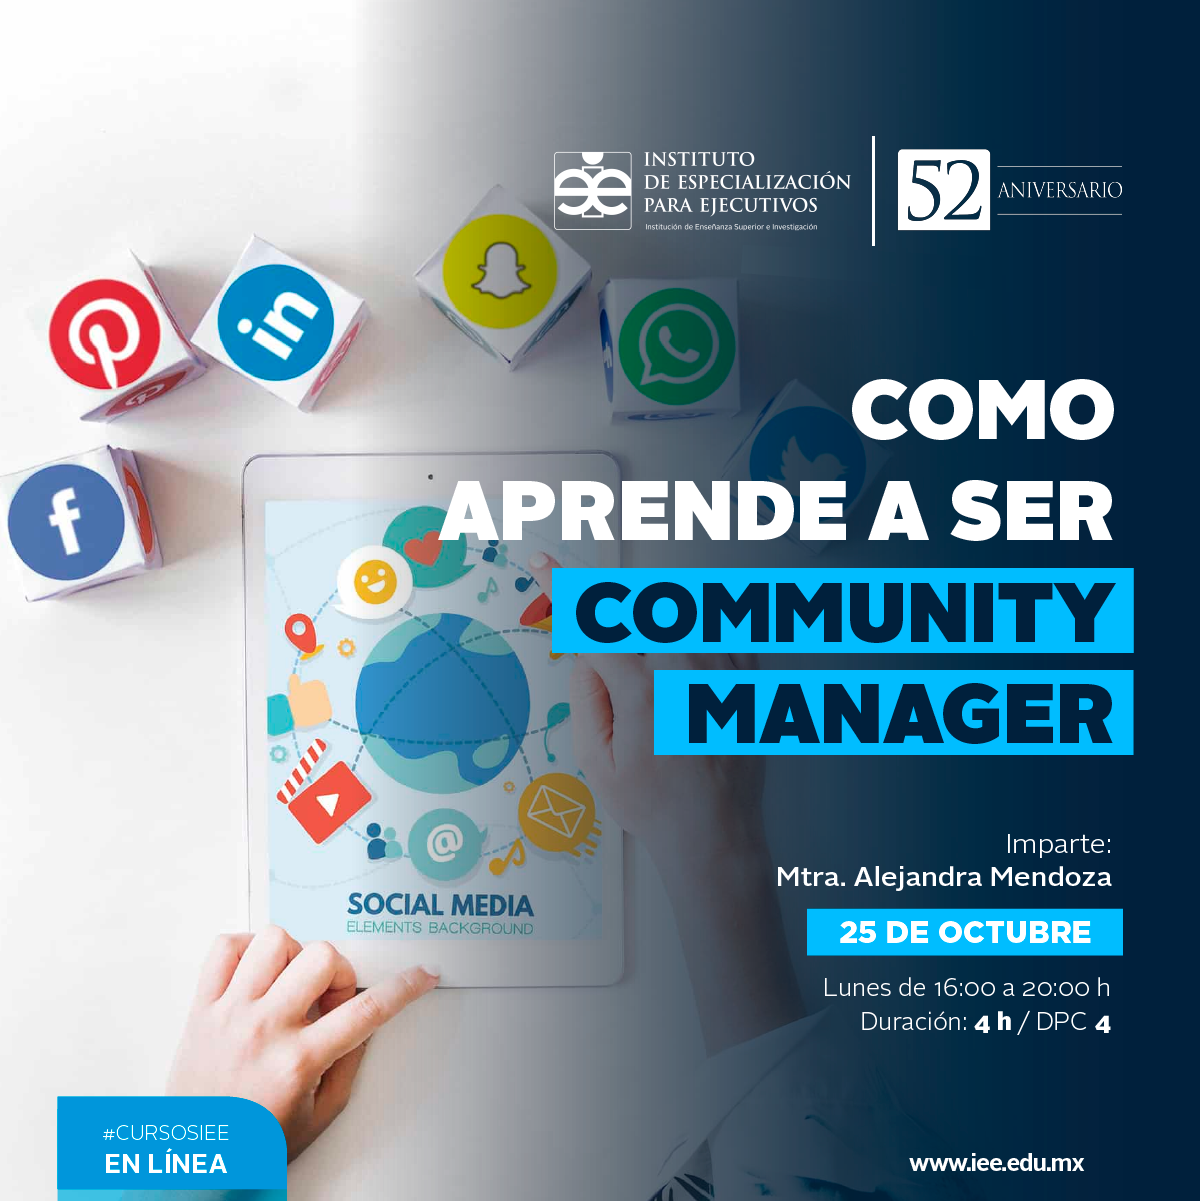 Curso en Línea en Como Aprende a ser Community Manager